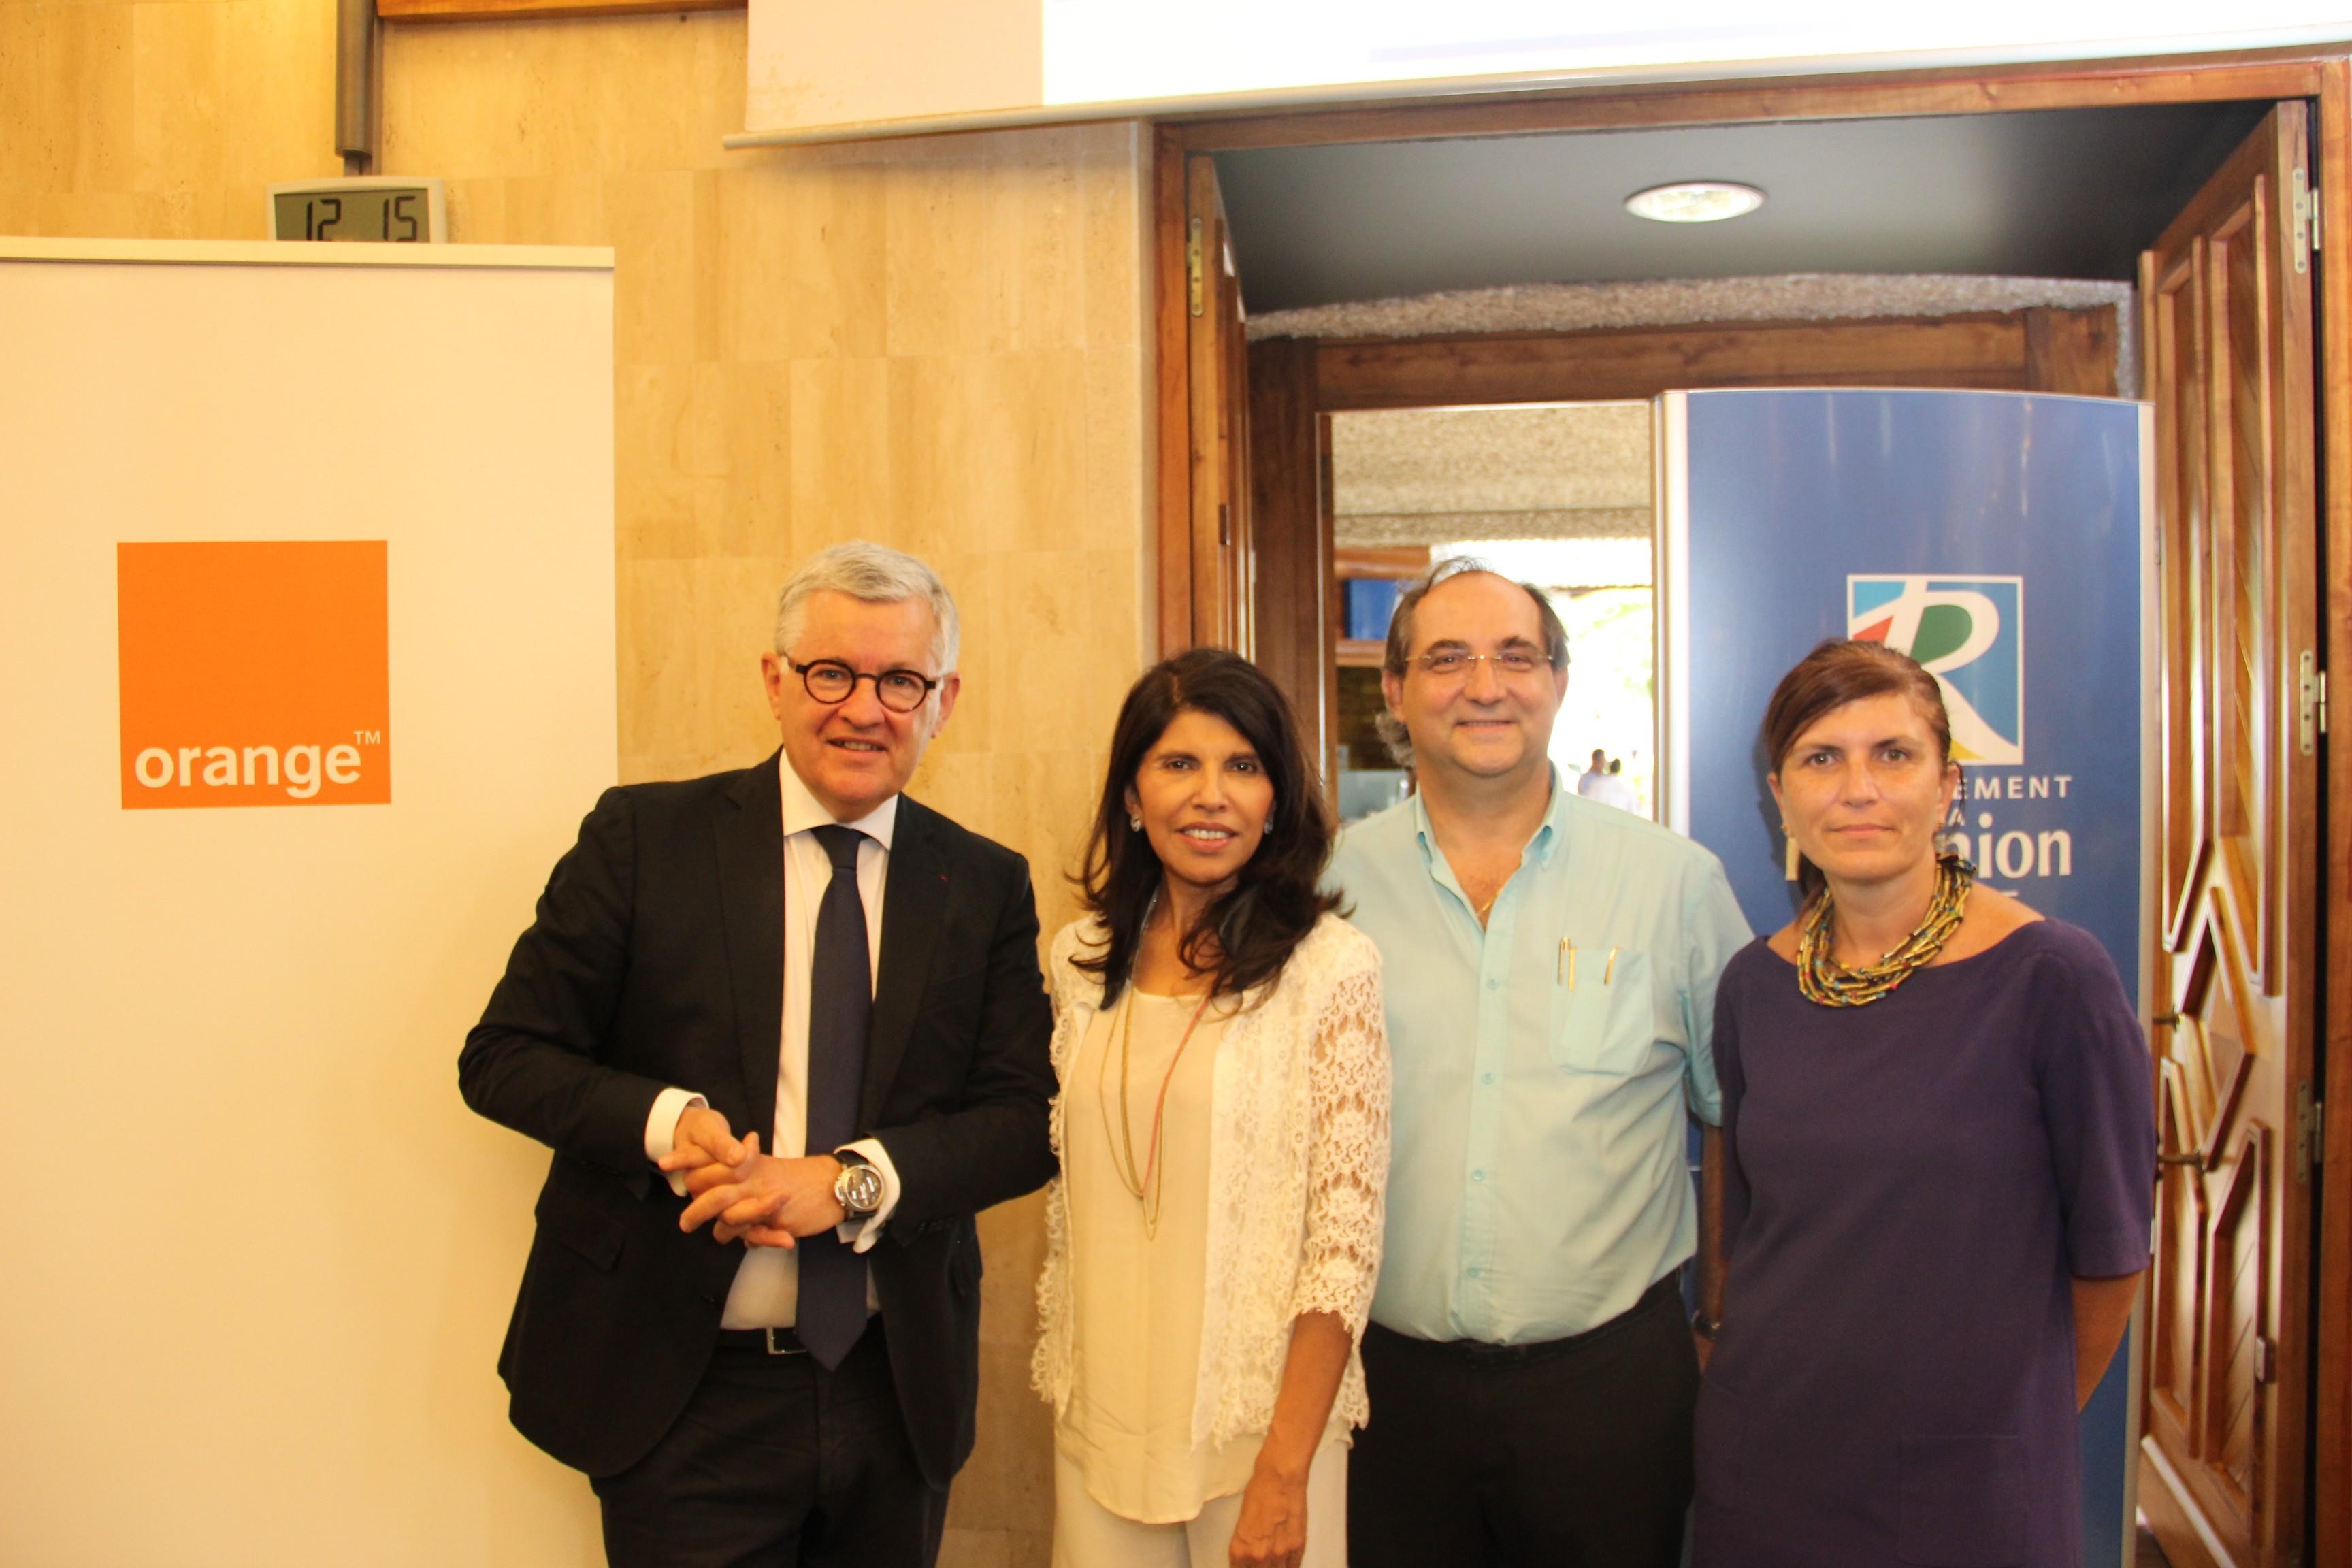 Photo : Orange Réunion – Bruno Janet – Nassimah Dindar , Stéphane Fouassin – Mireille Helou